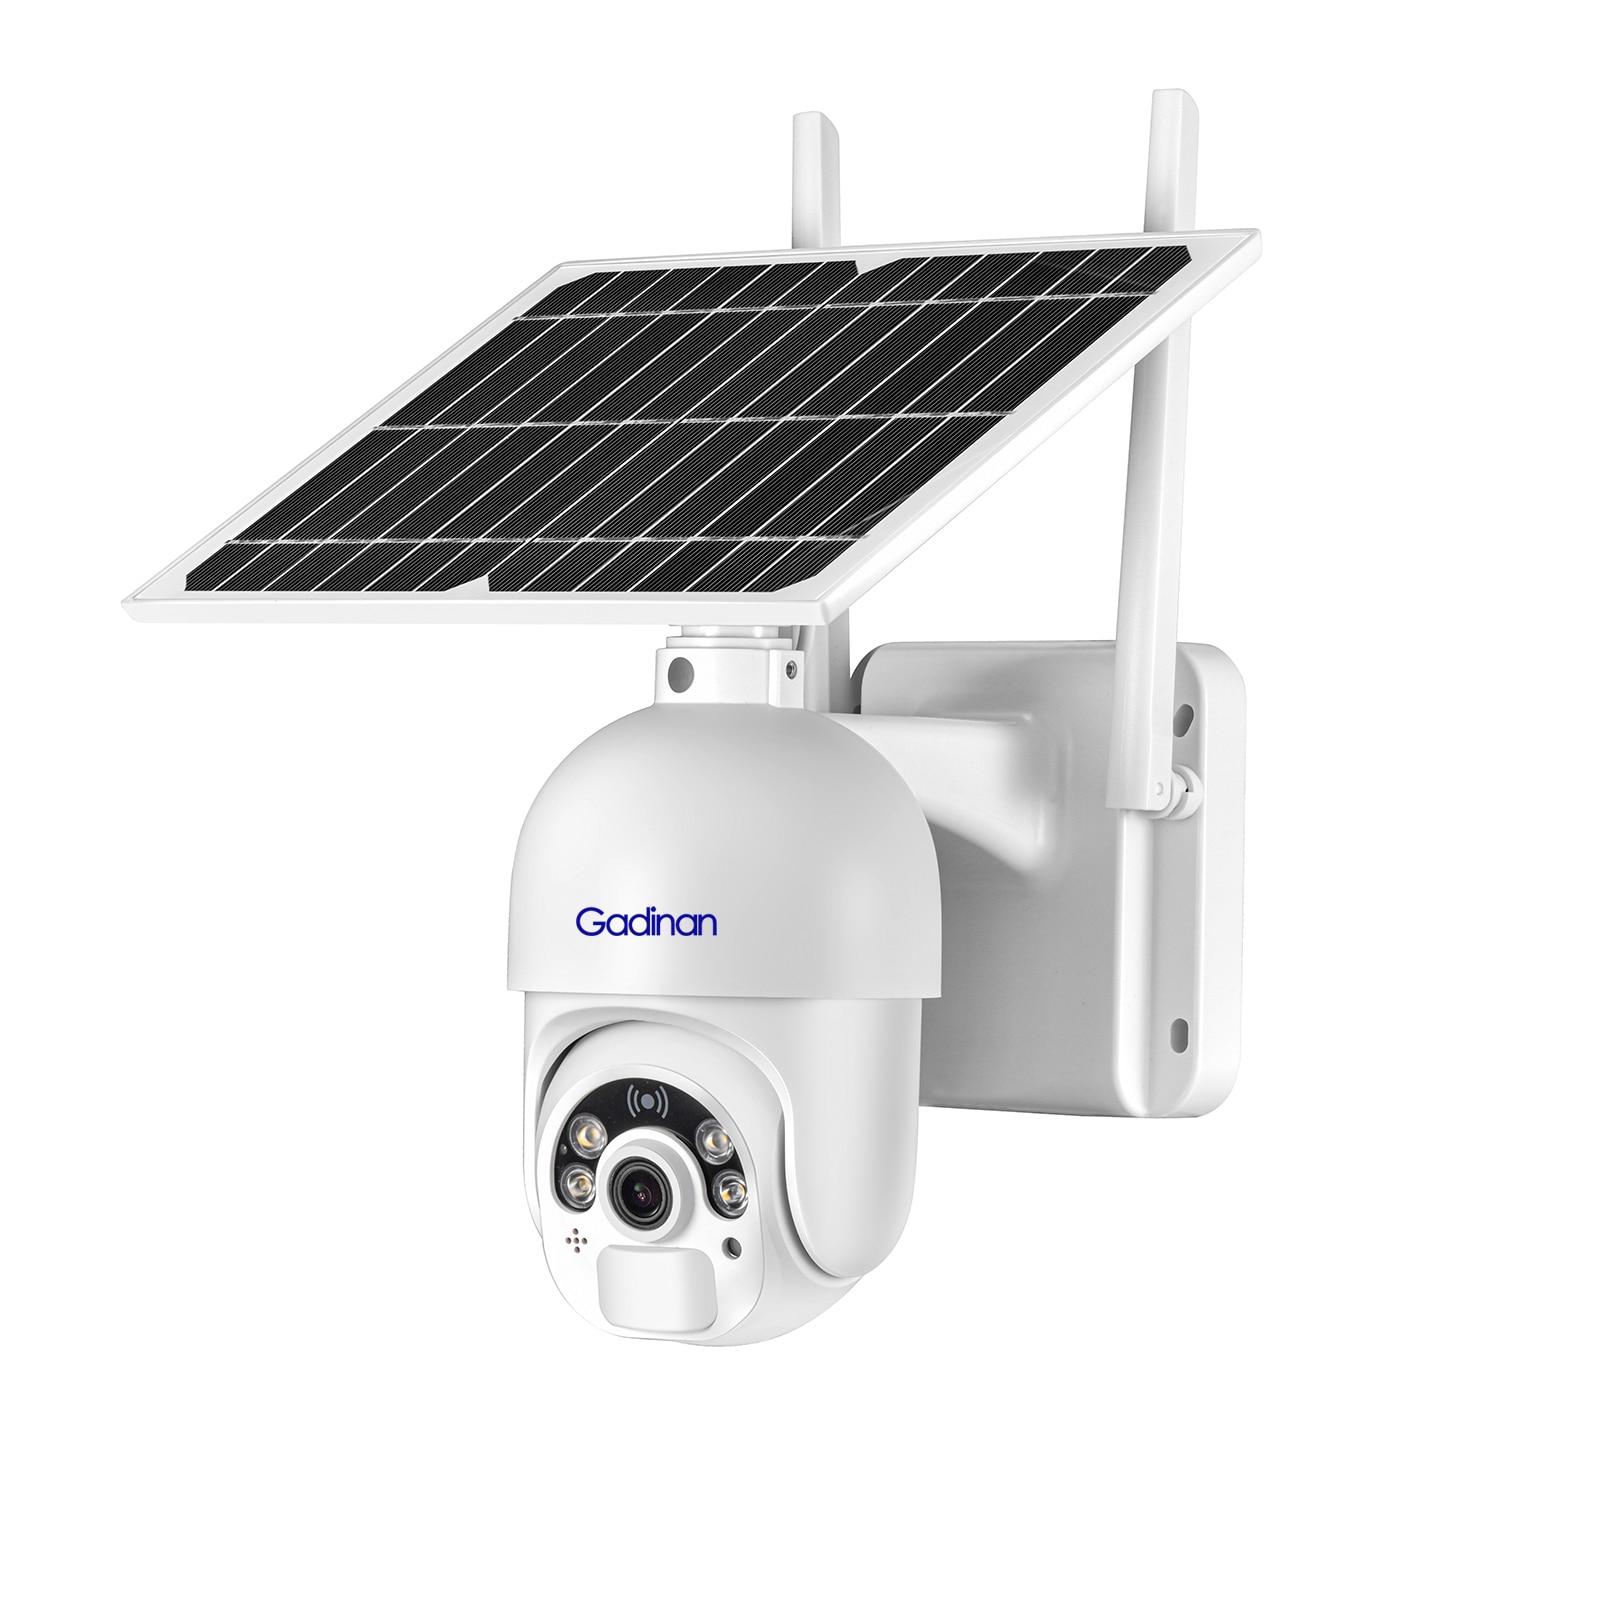 PTZ Camera 4G SIM Card /WIFI 1080P HD Solar Panel Outdoor Monitoring CCTV Camera Smart Home Two-way Intrusion Alarm Long Standby